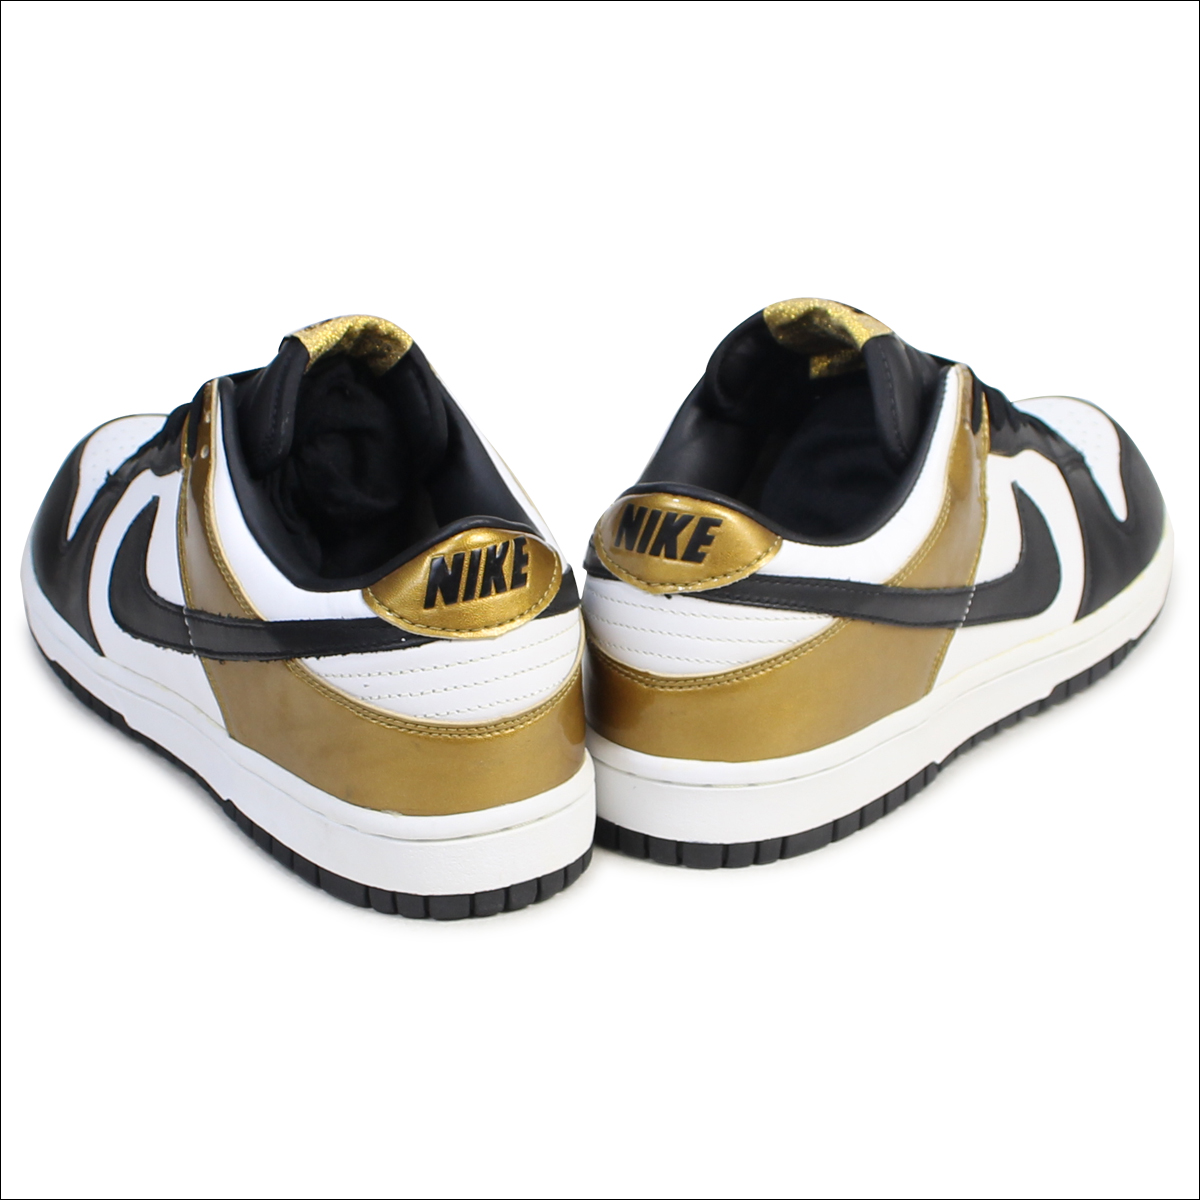 Nike 431 Dunk 309 Courir Sneakers Men White Low 103 wOZPkiuXT